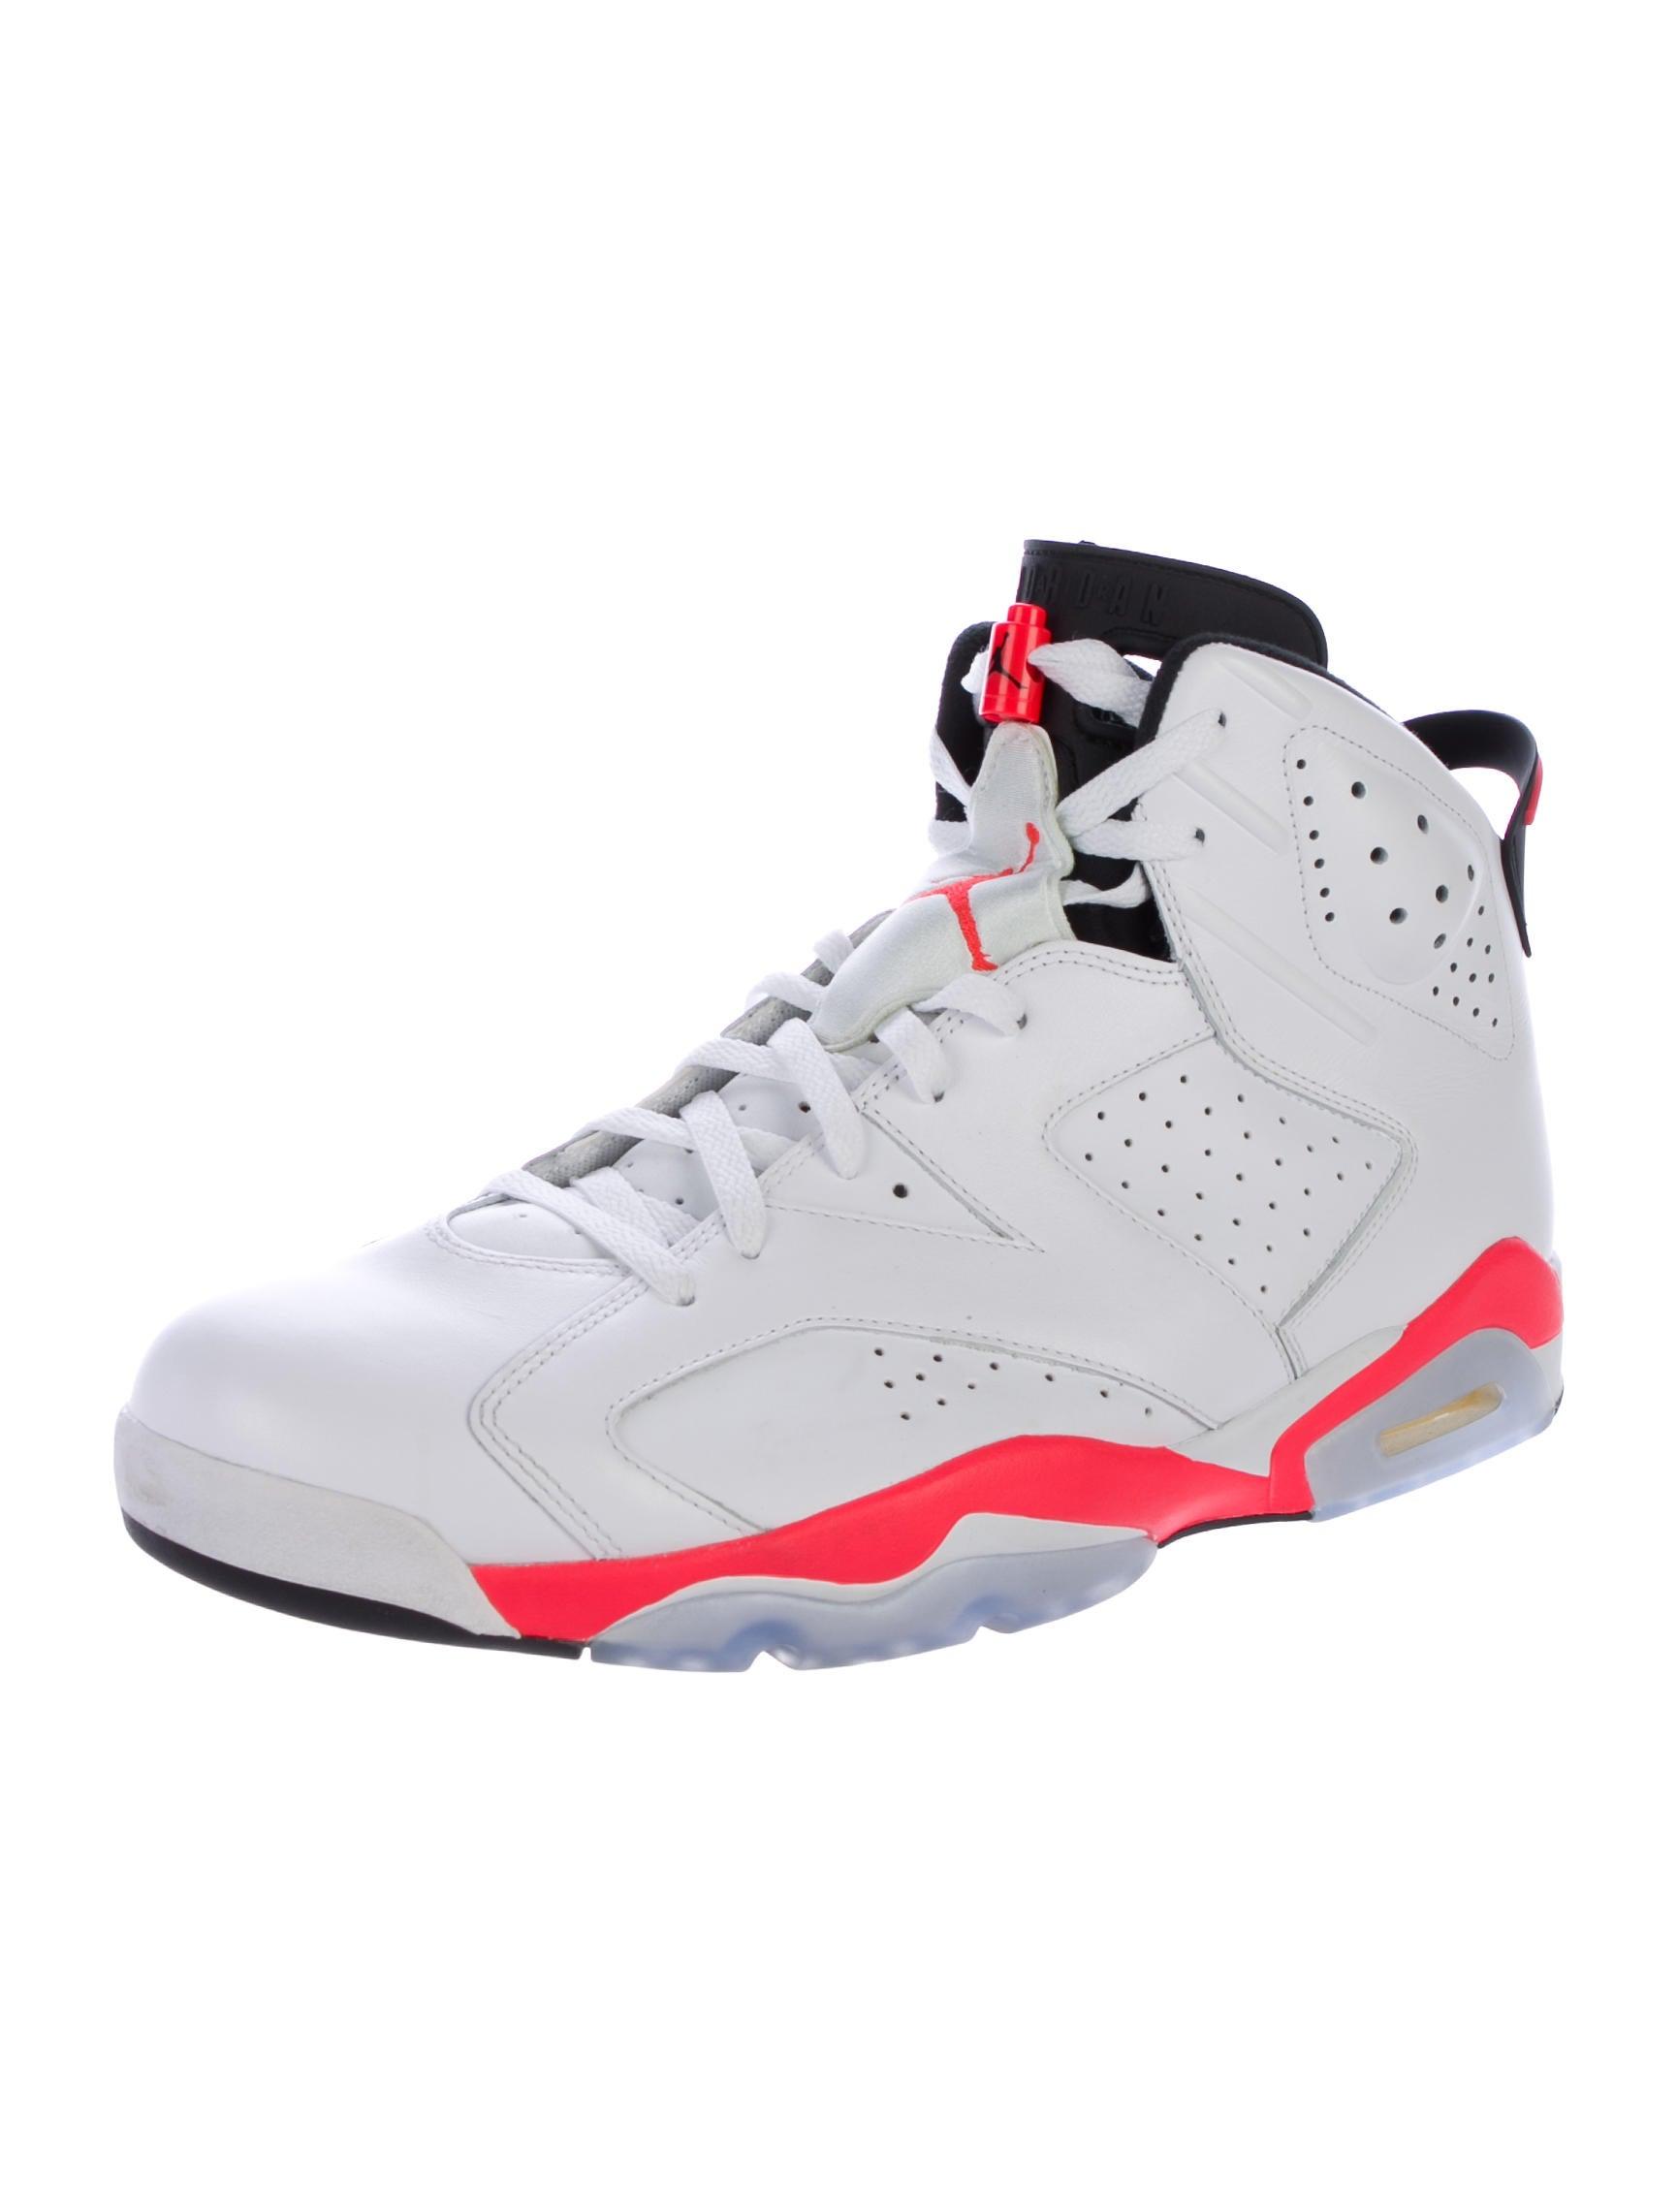 nike air jordan 6 retro infrared sneakers shoes wniaj20378 the realreal. Black Bedroom Furniture Sets. Home Design Ideas